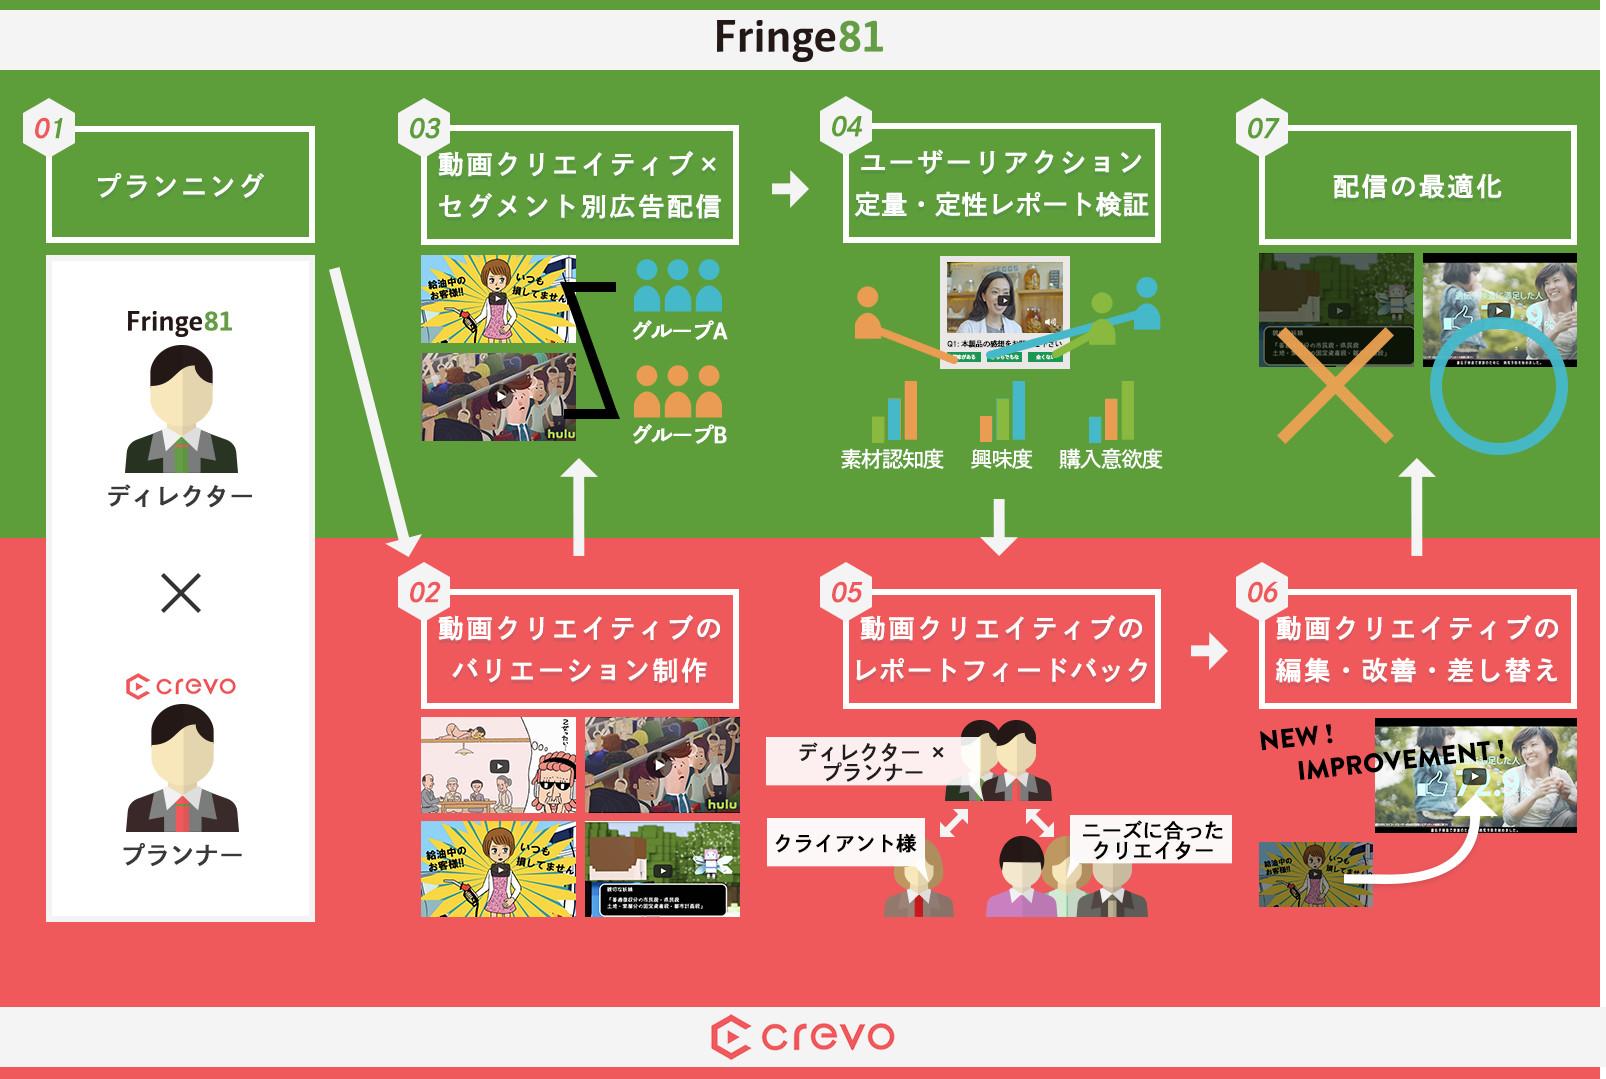 fringe81とCrevo